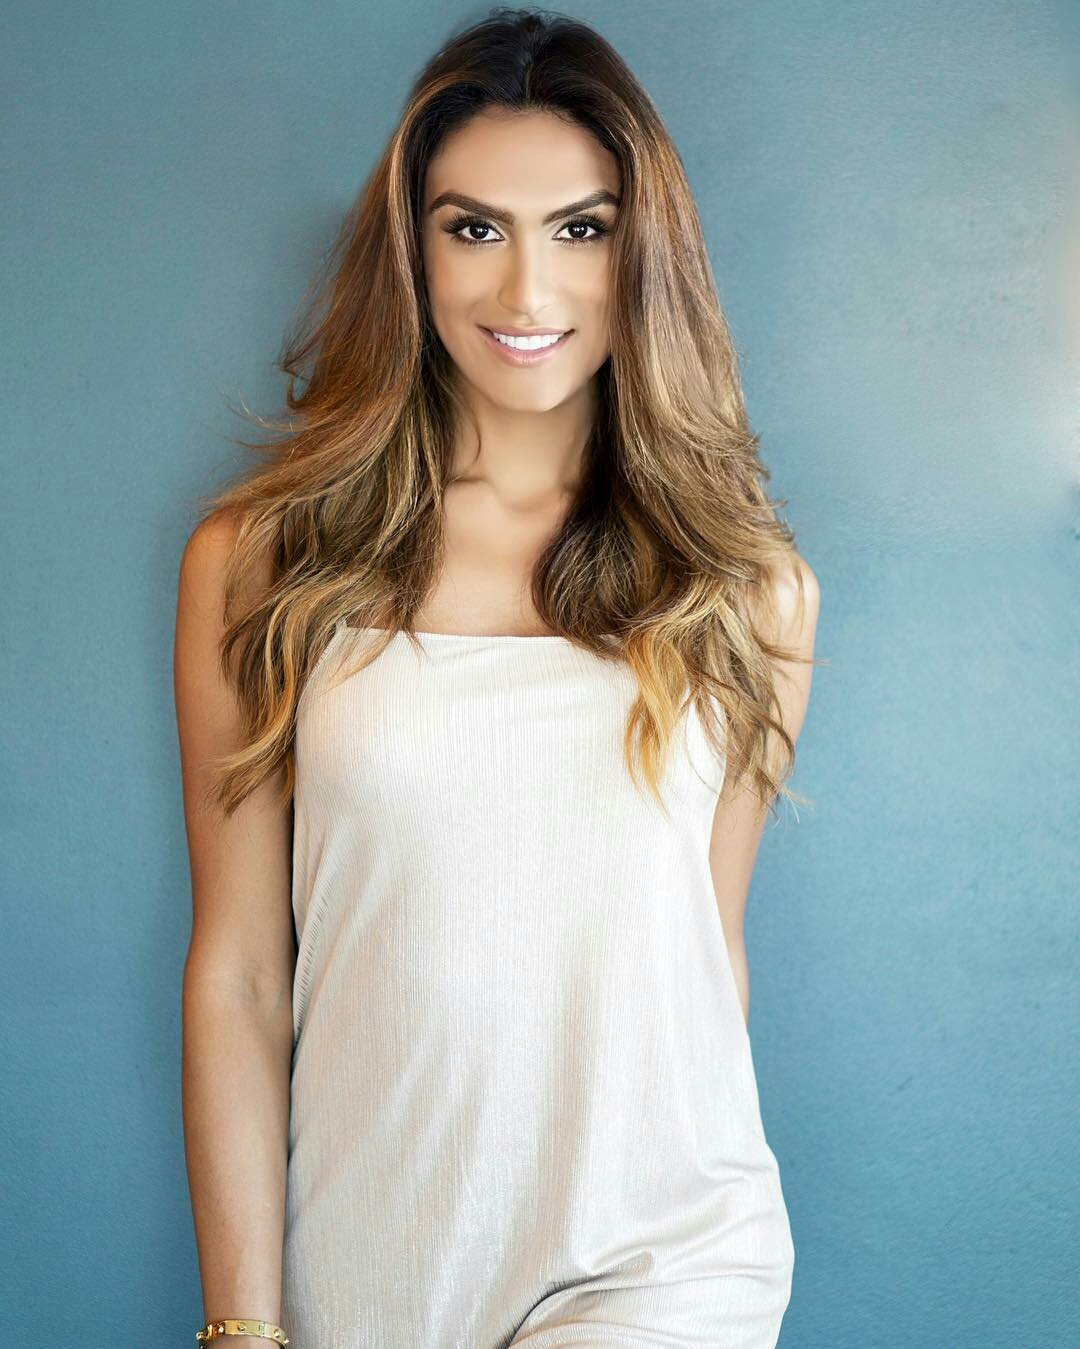 Isabella Santiago - Beautiful Venezuelan Transsexual Model